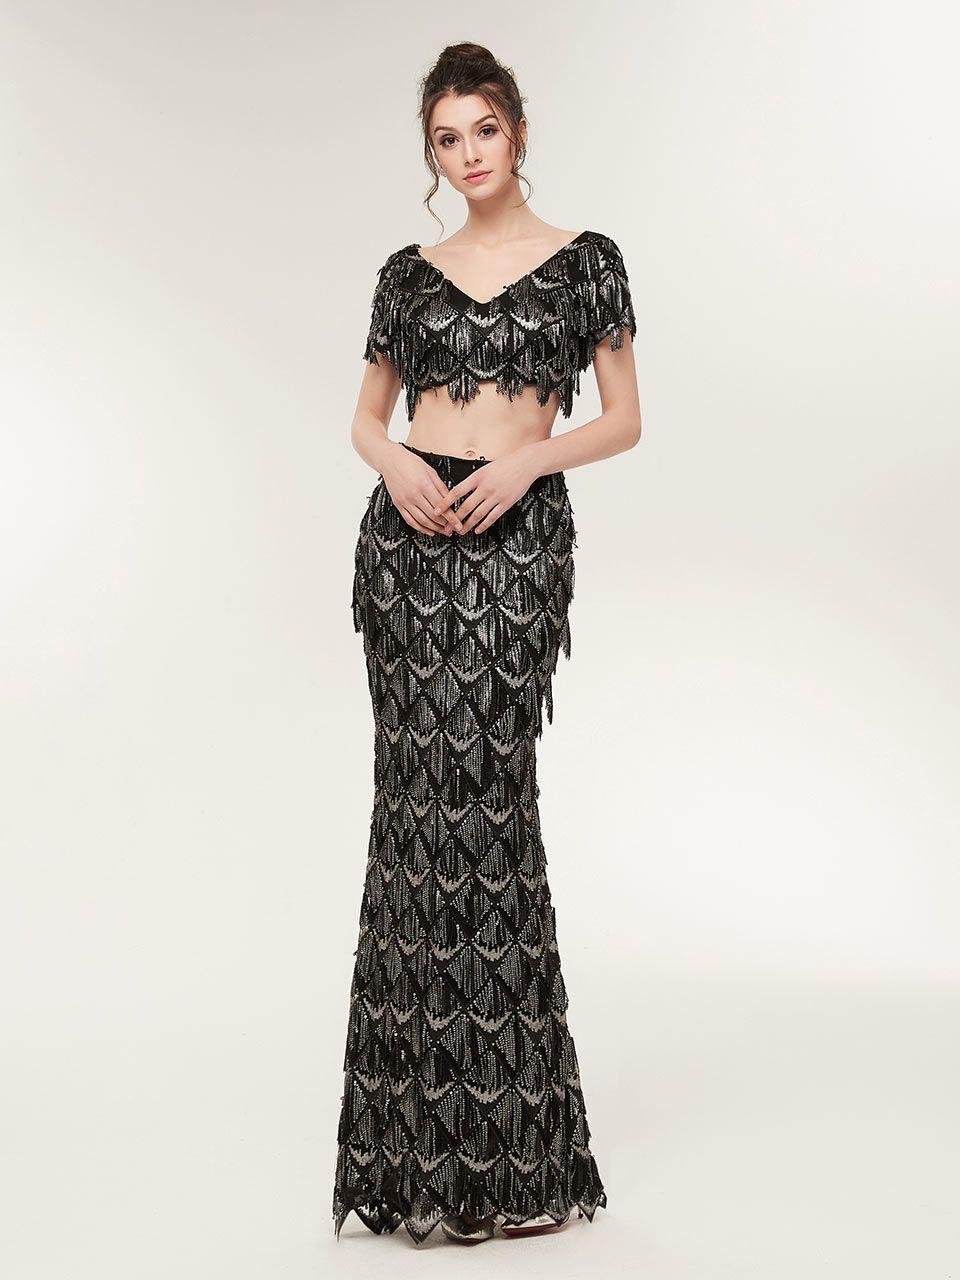 Mermaid black prom dressesblack sequin prom dressestwo piece black